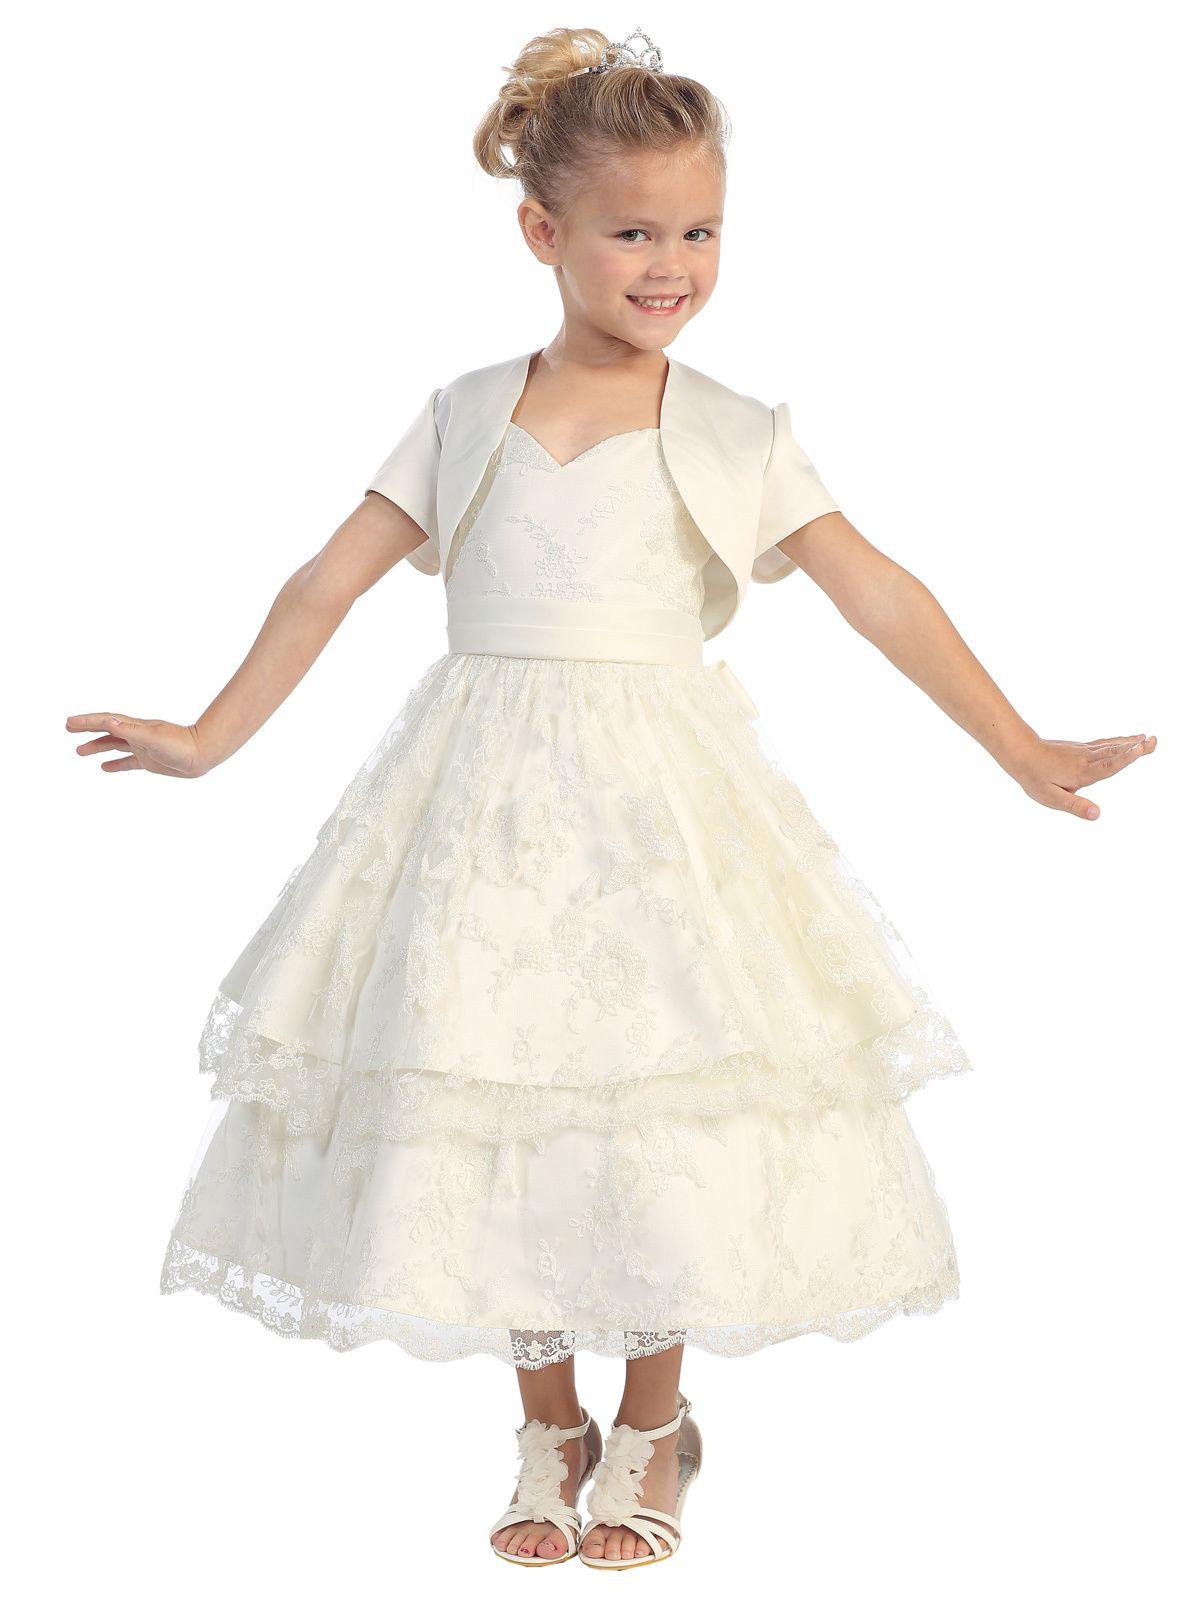 8edac6e23287 Wedding Dresses, Gowns, Bridesmaid Dresses Ft Worth, Dallas TX ...